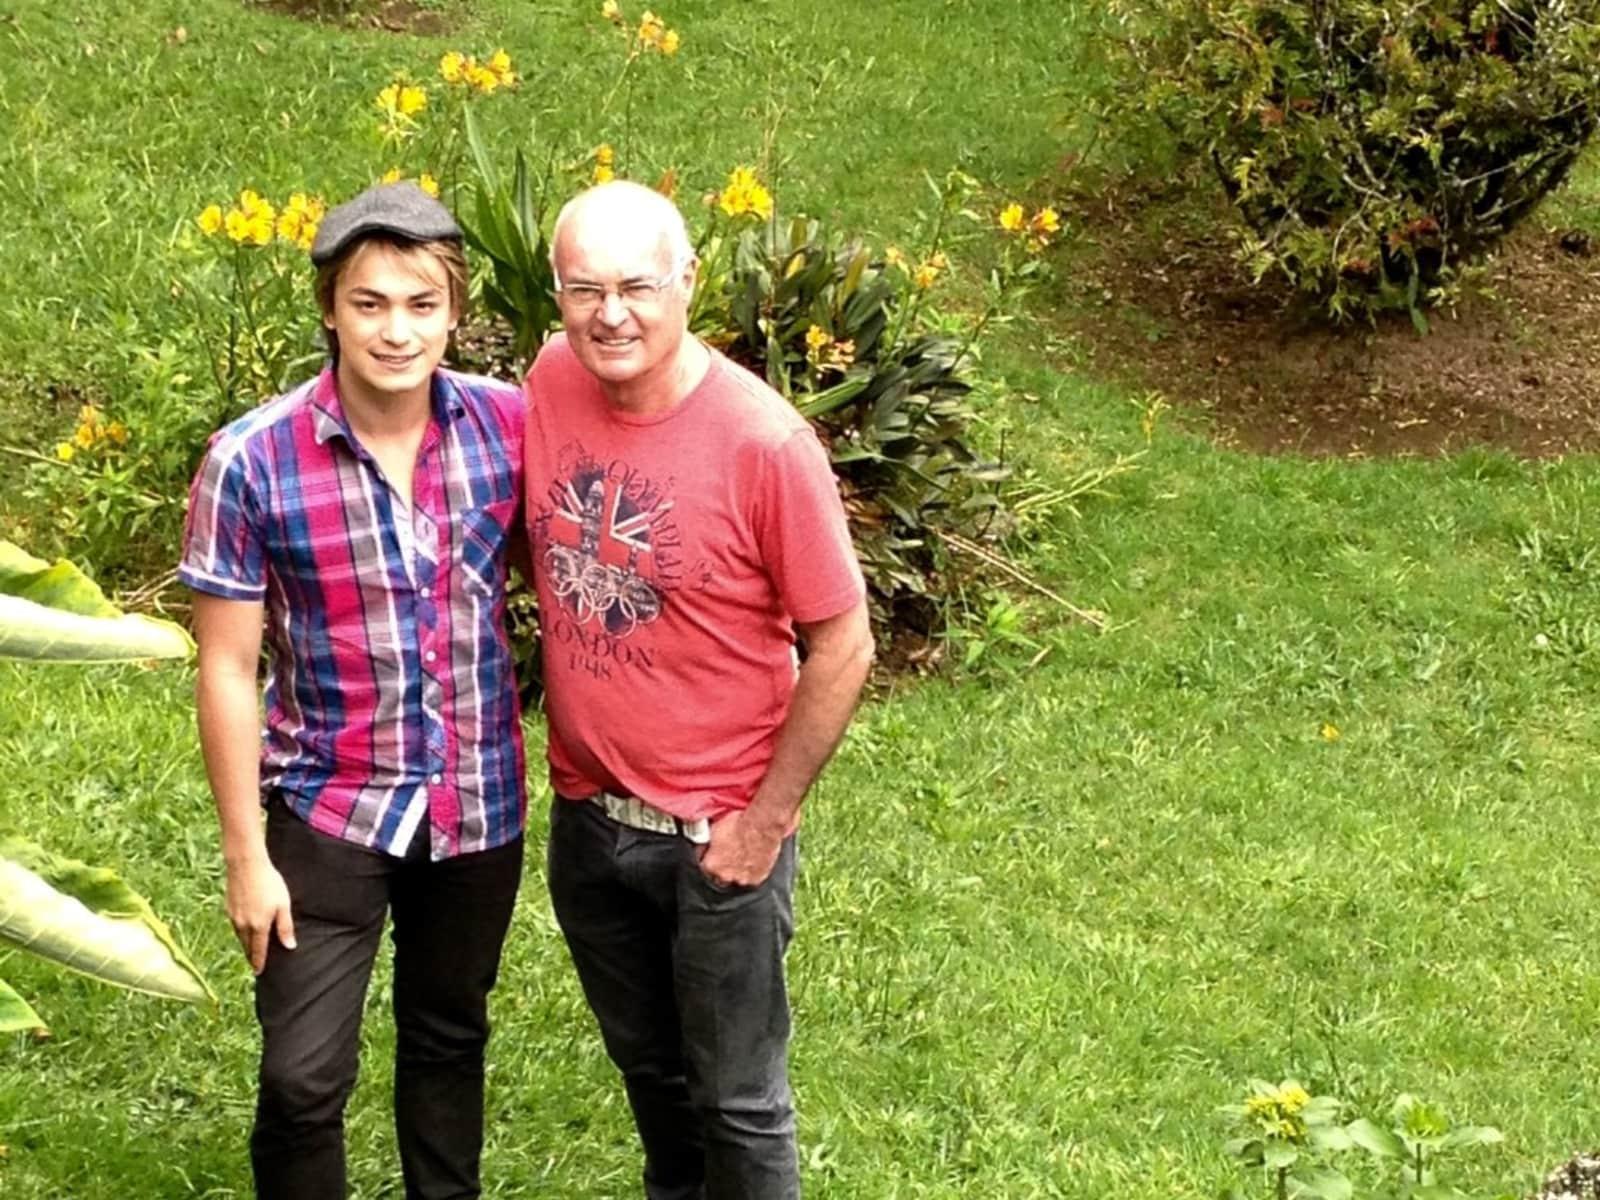 Patrick & Andres from Mexico City, Mexico